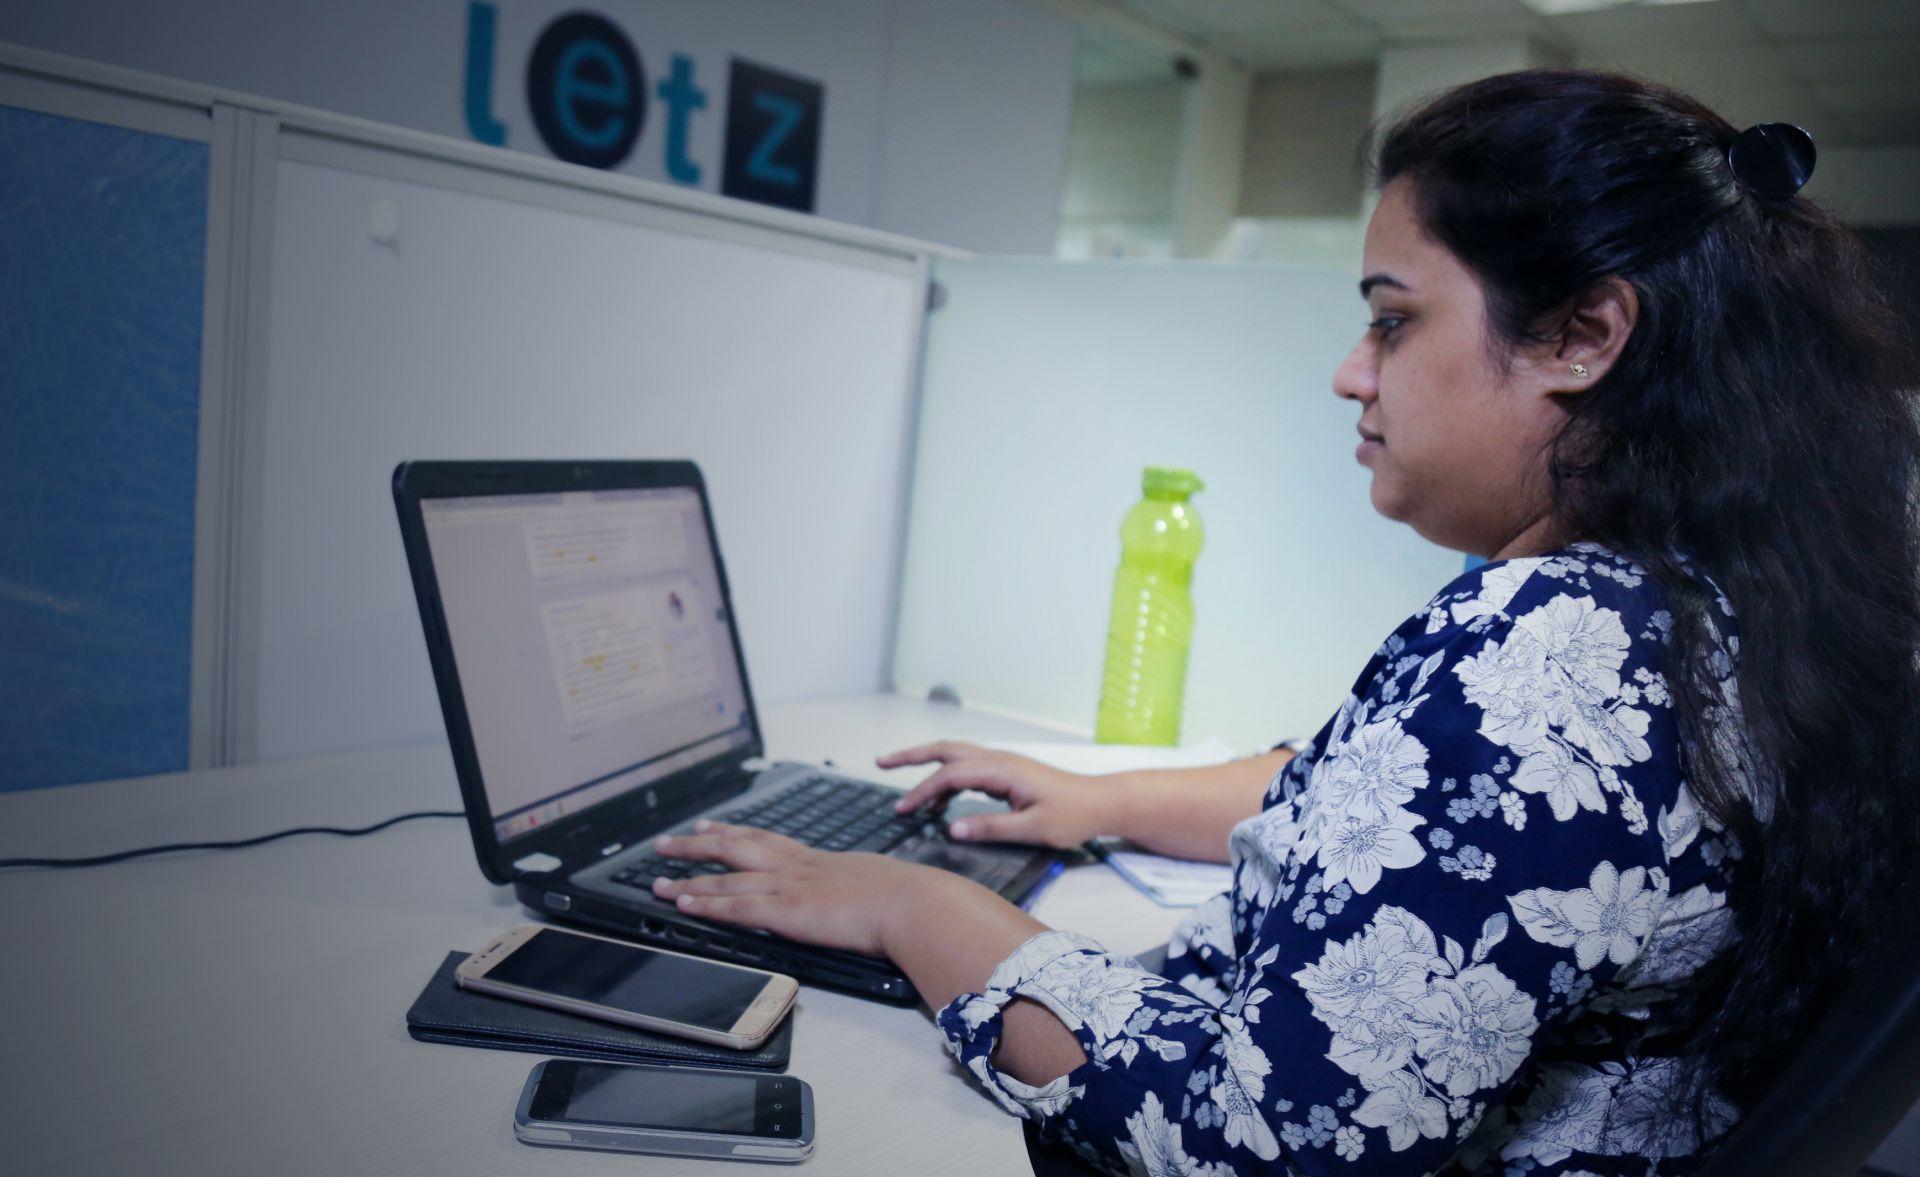 Workie, Indore